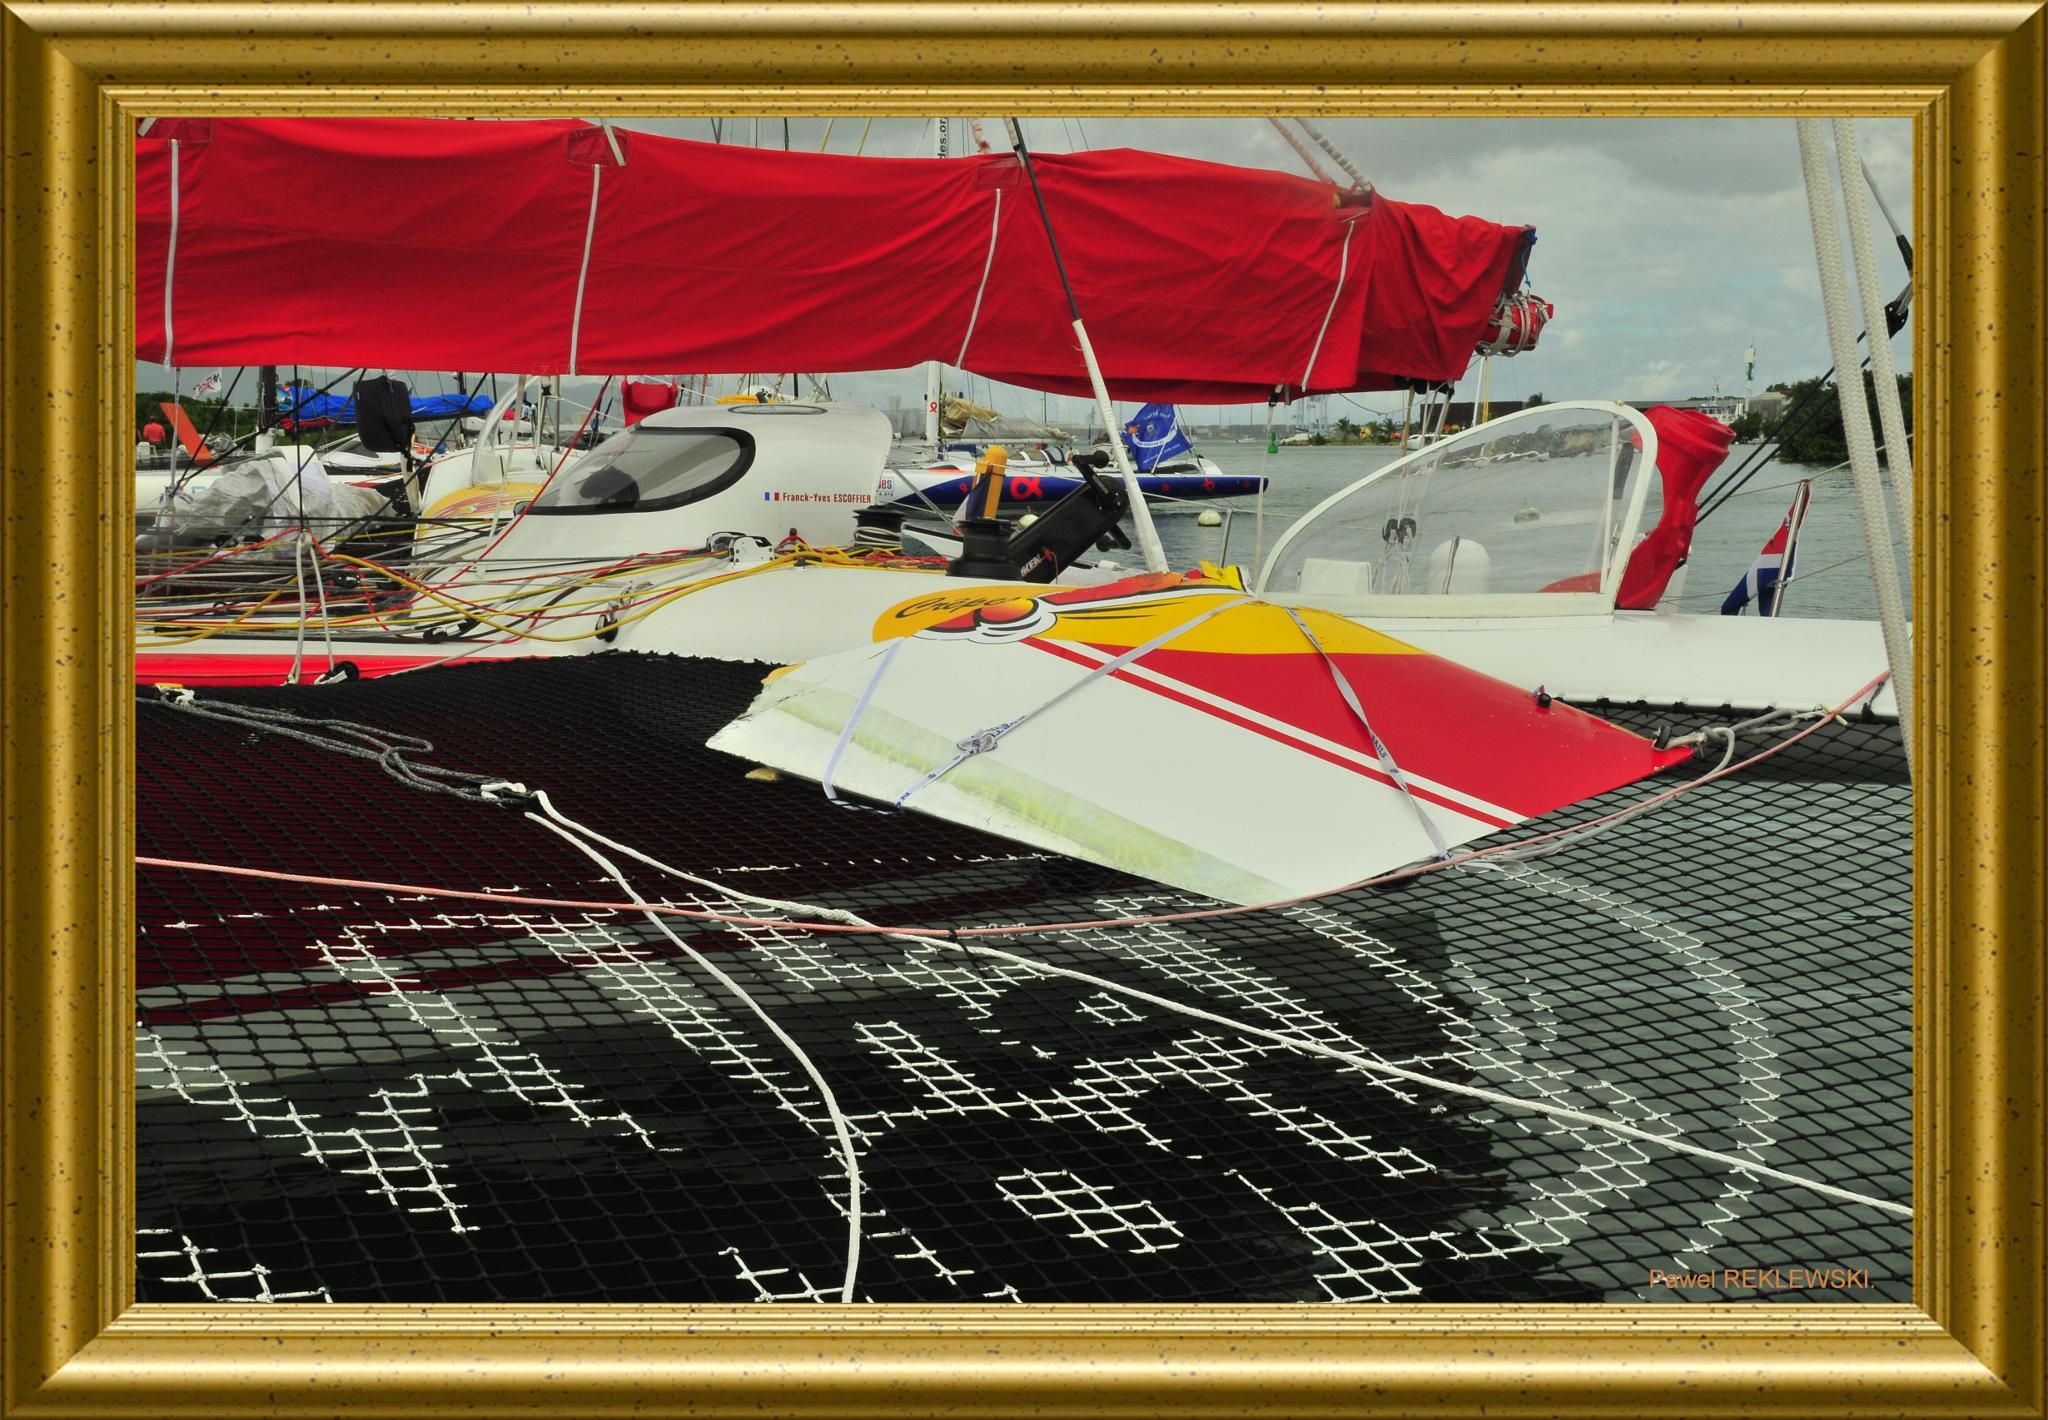 atlantic crash 2  by pawelreklewski82